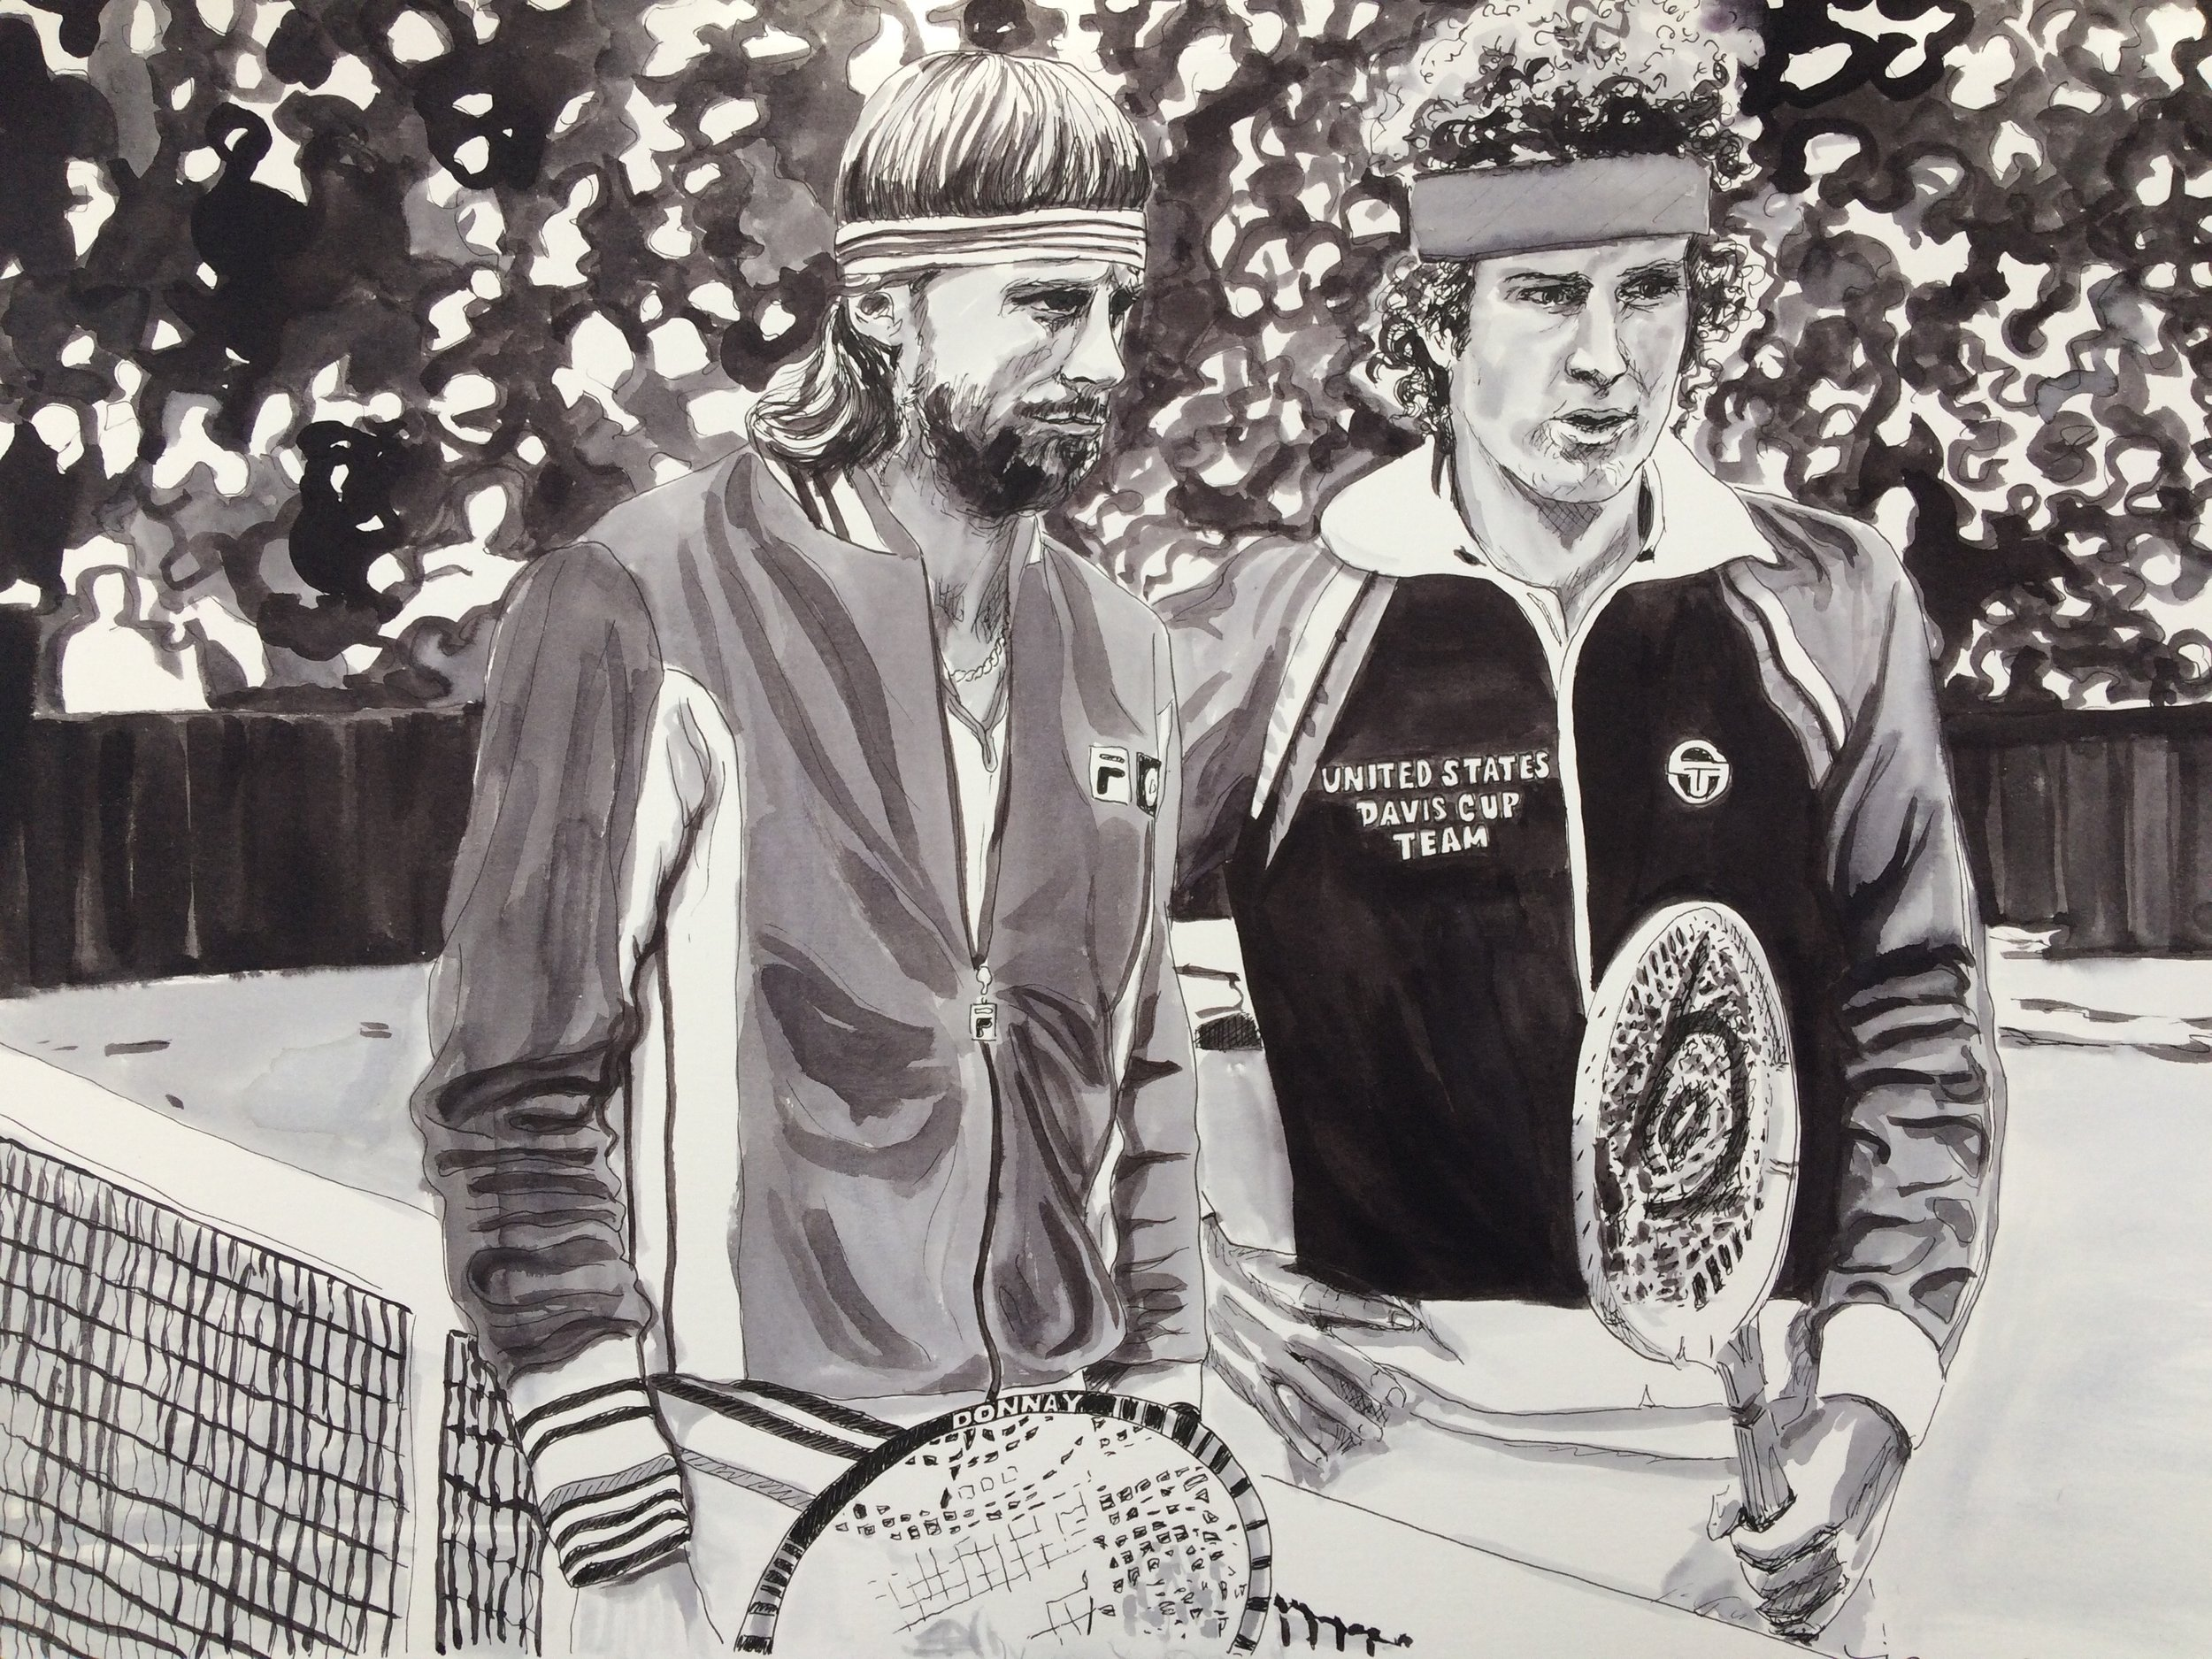 John McEnroe and Bjorn Borg, 1980 men's singles final at Wimbledon